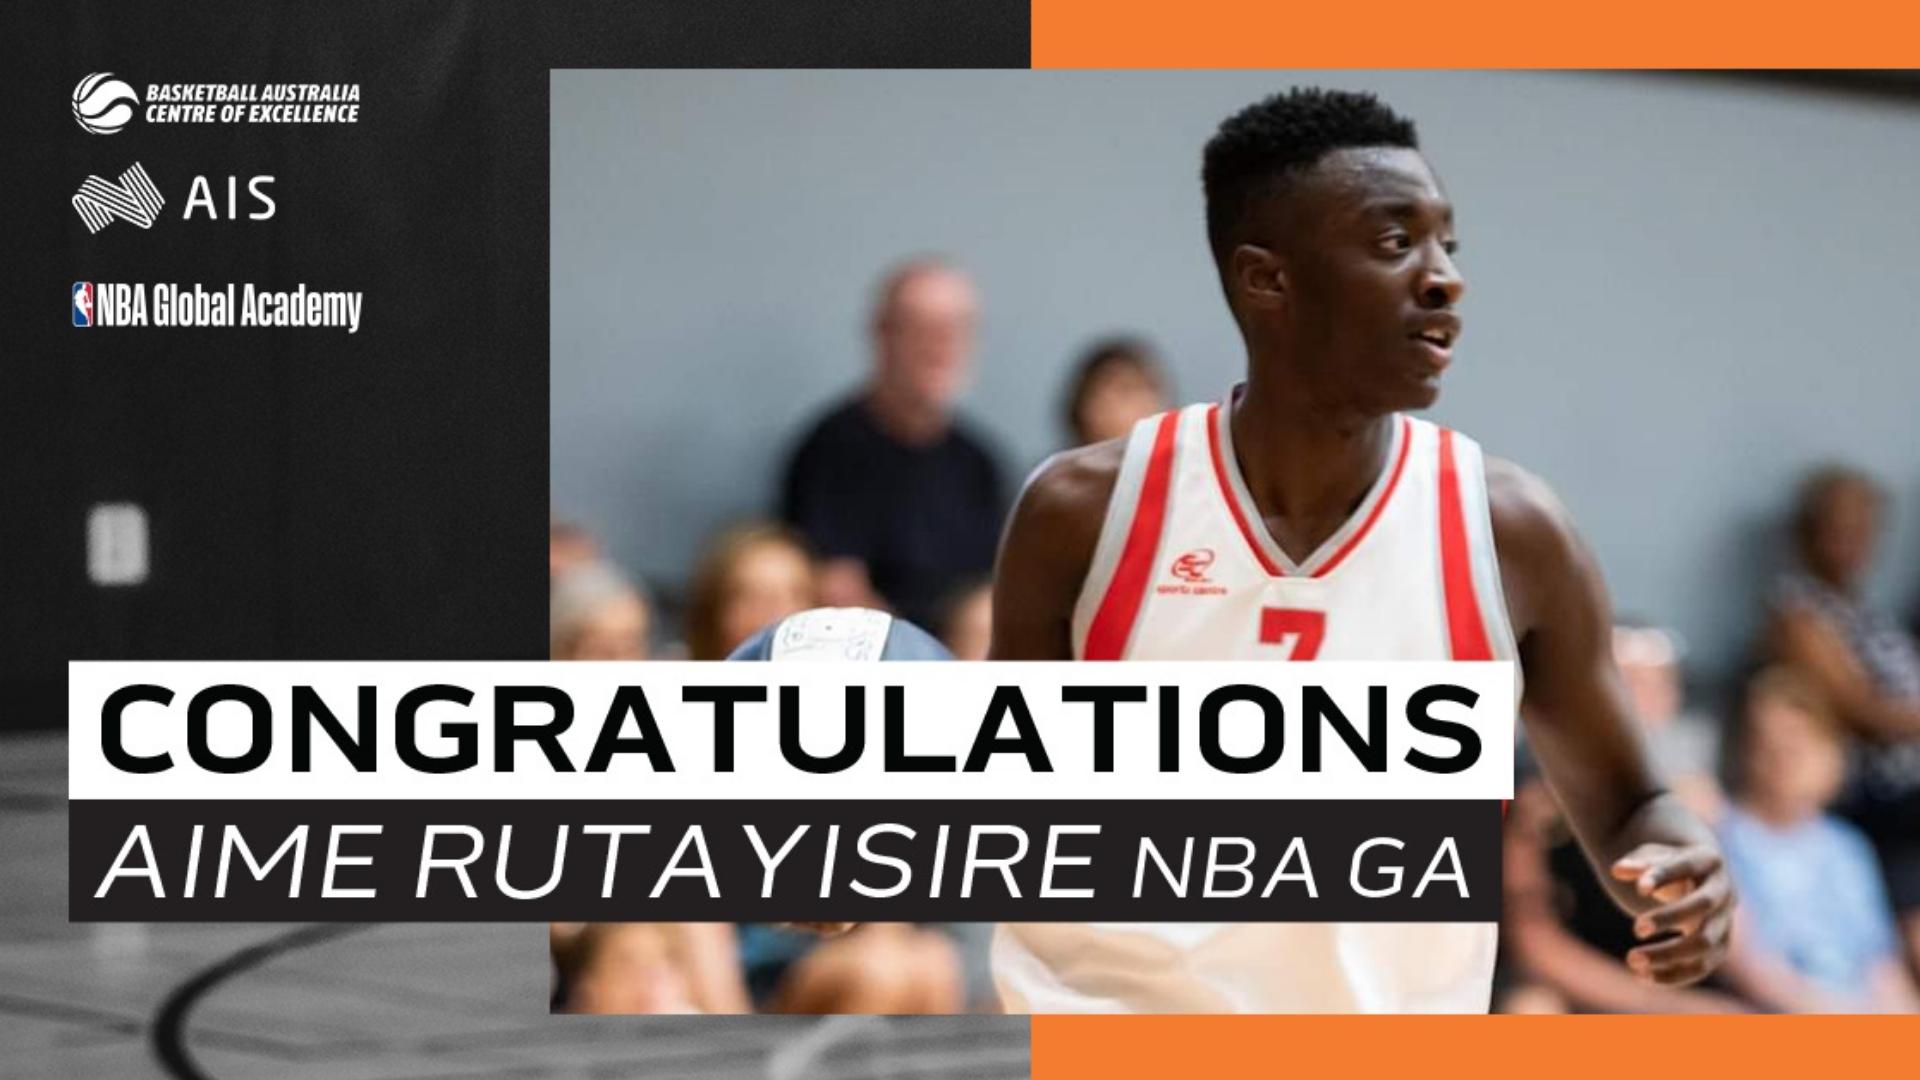 Australian Aime Rutayisire joins NBA Global Academy in Canberra